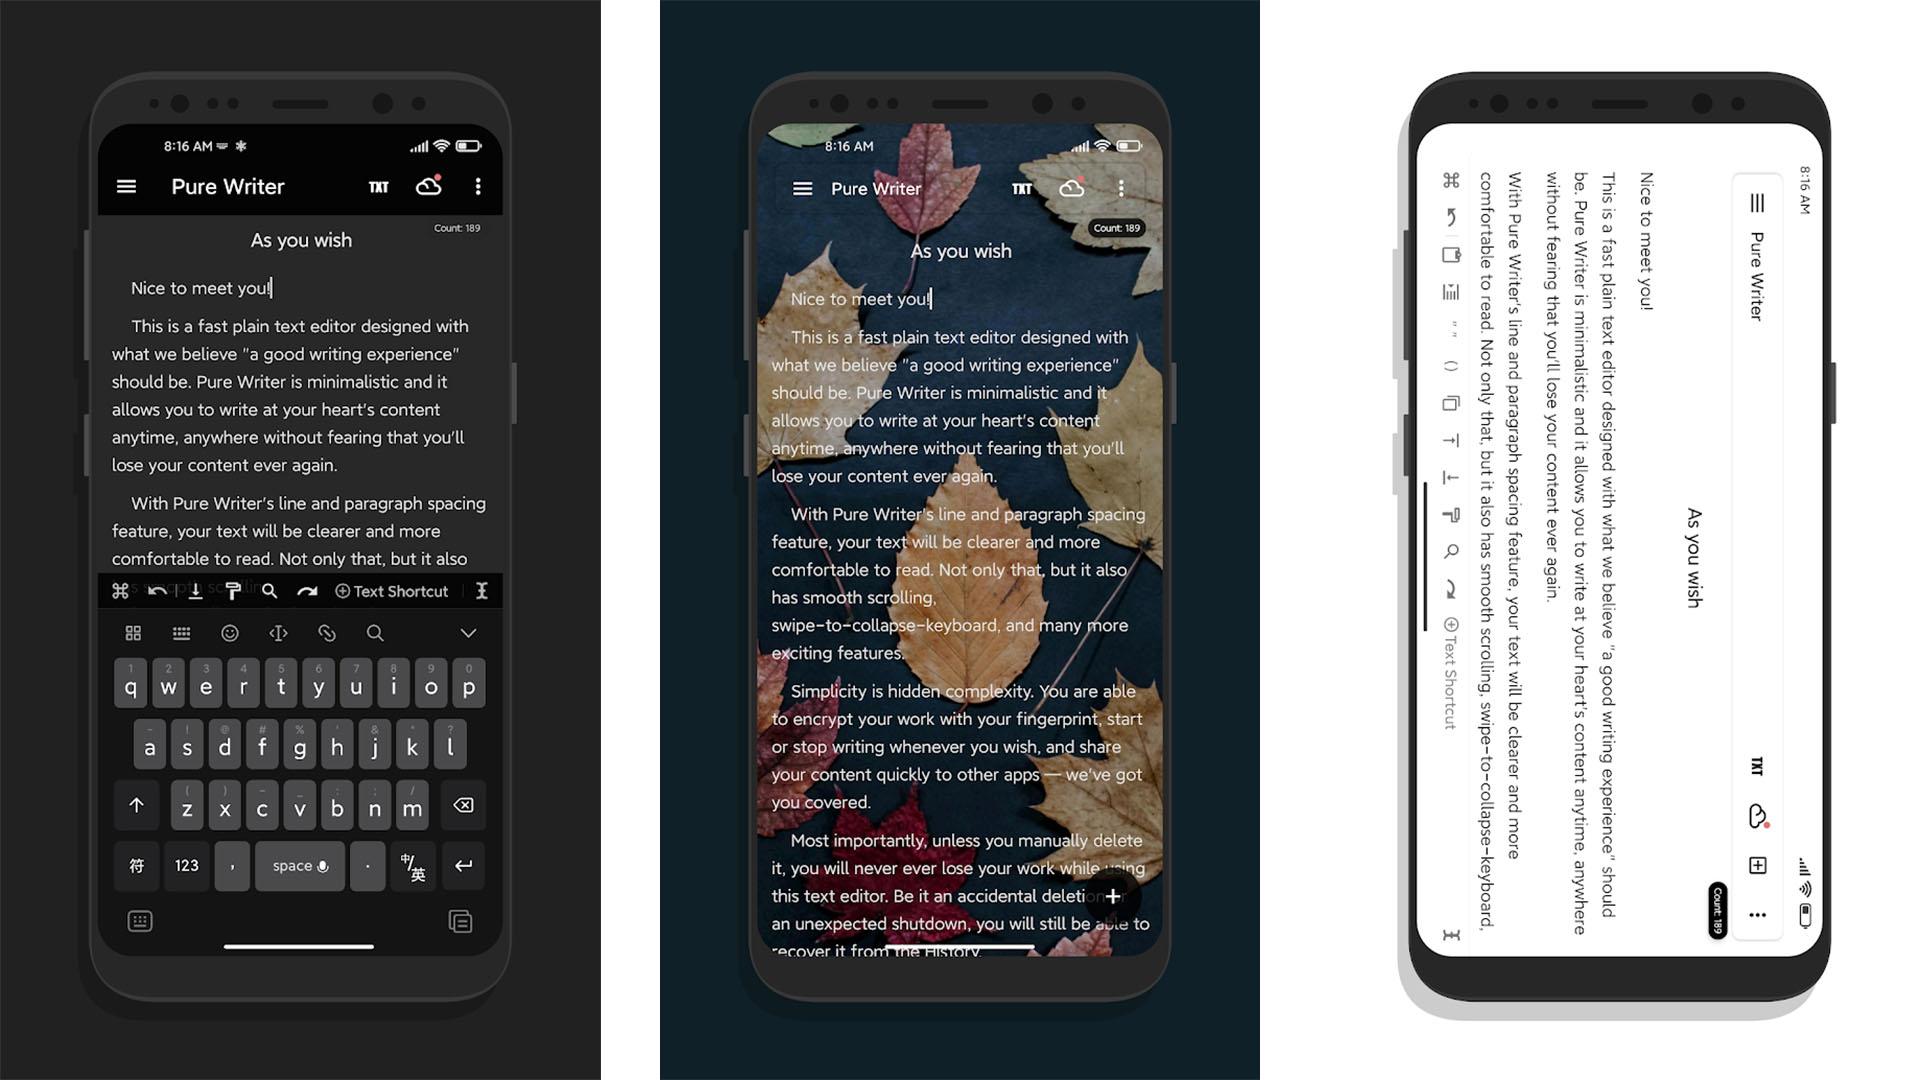 Pure Writer screenshot 2021